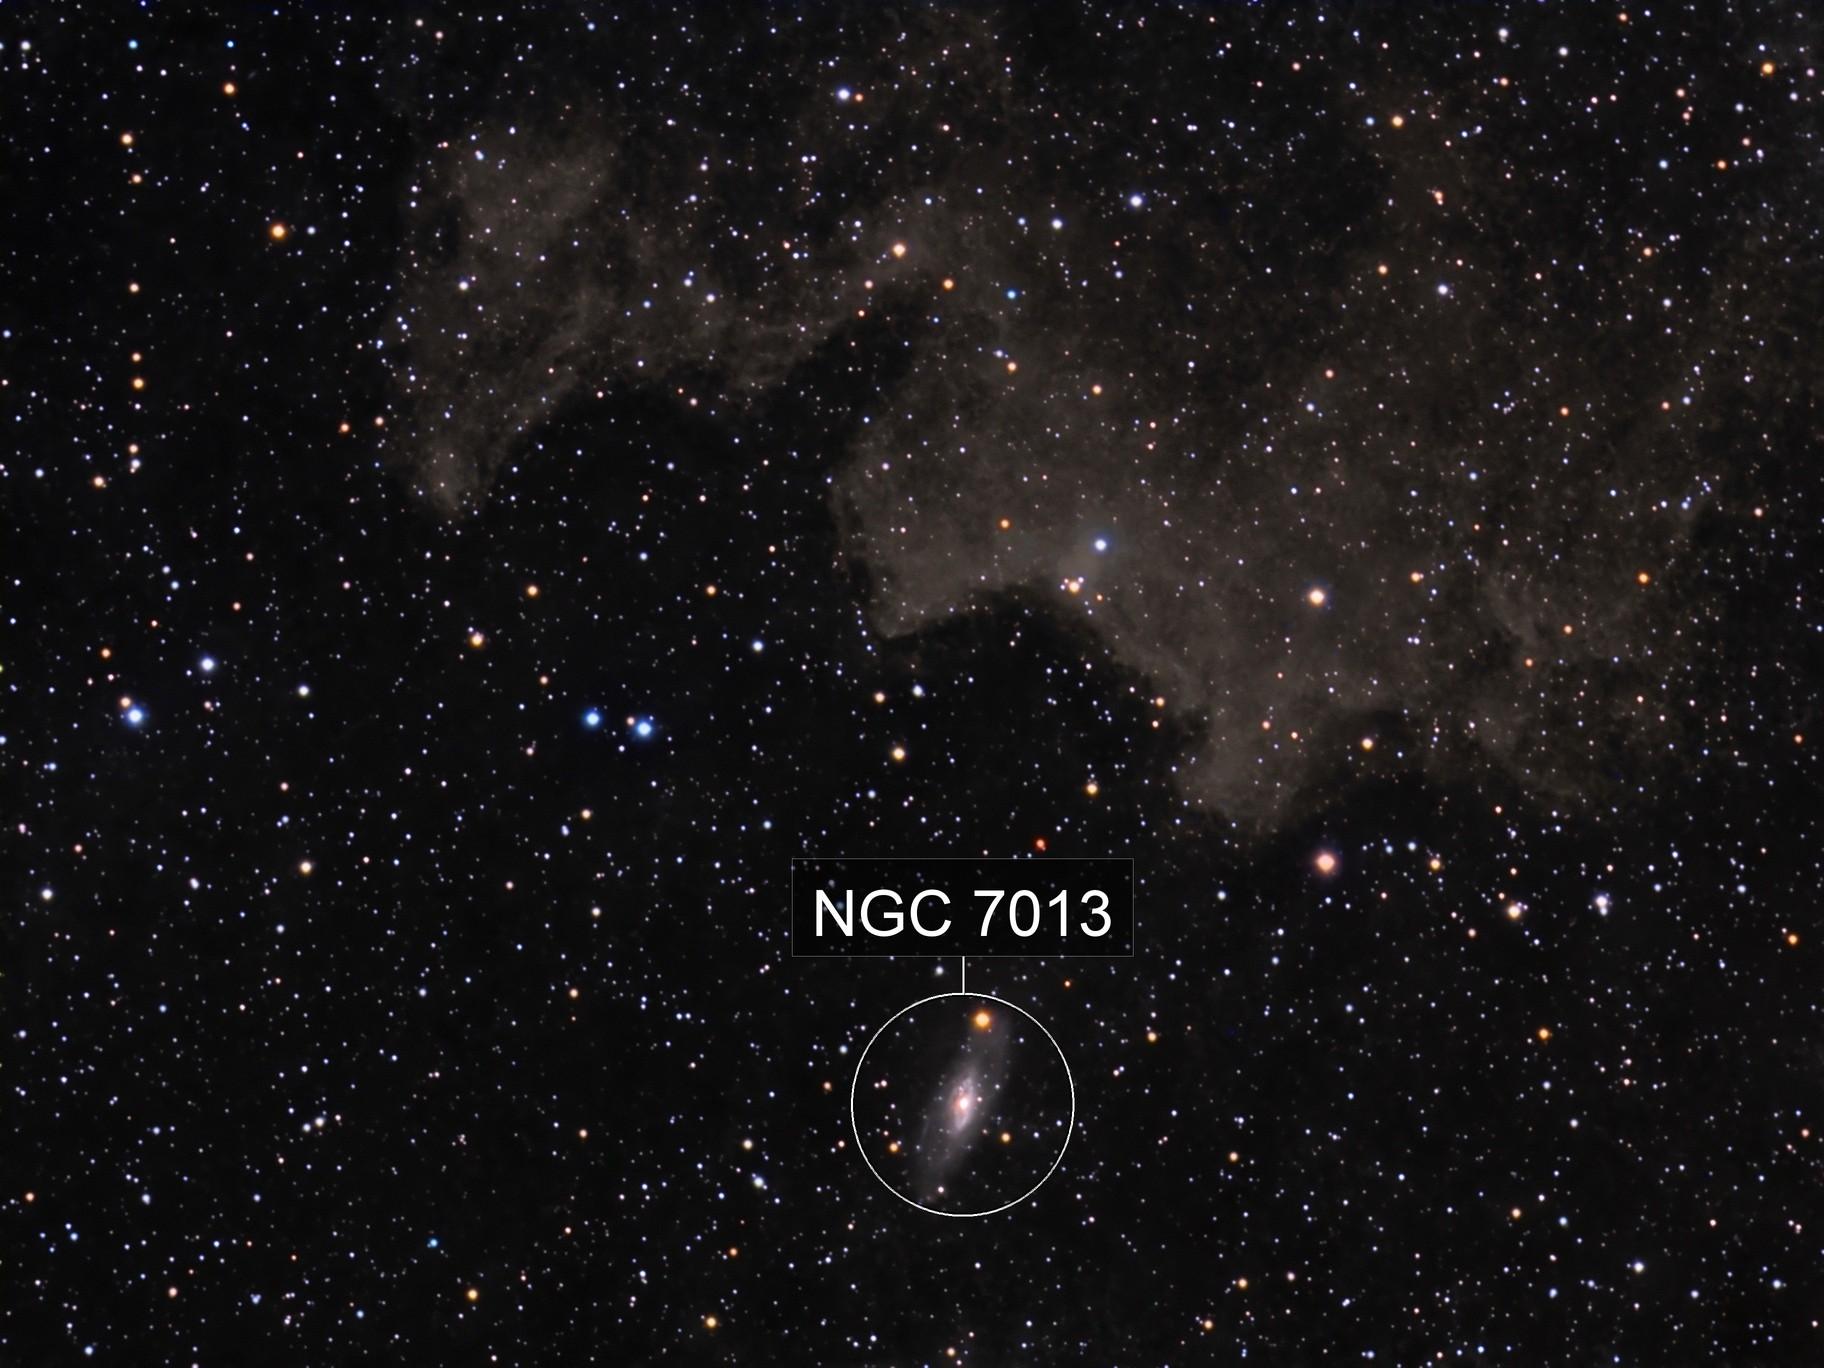 NGC 7013 in Cygnus